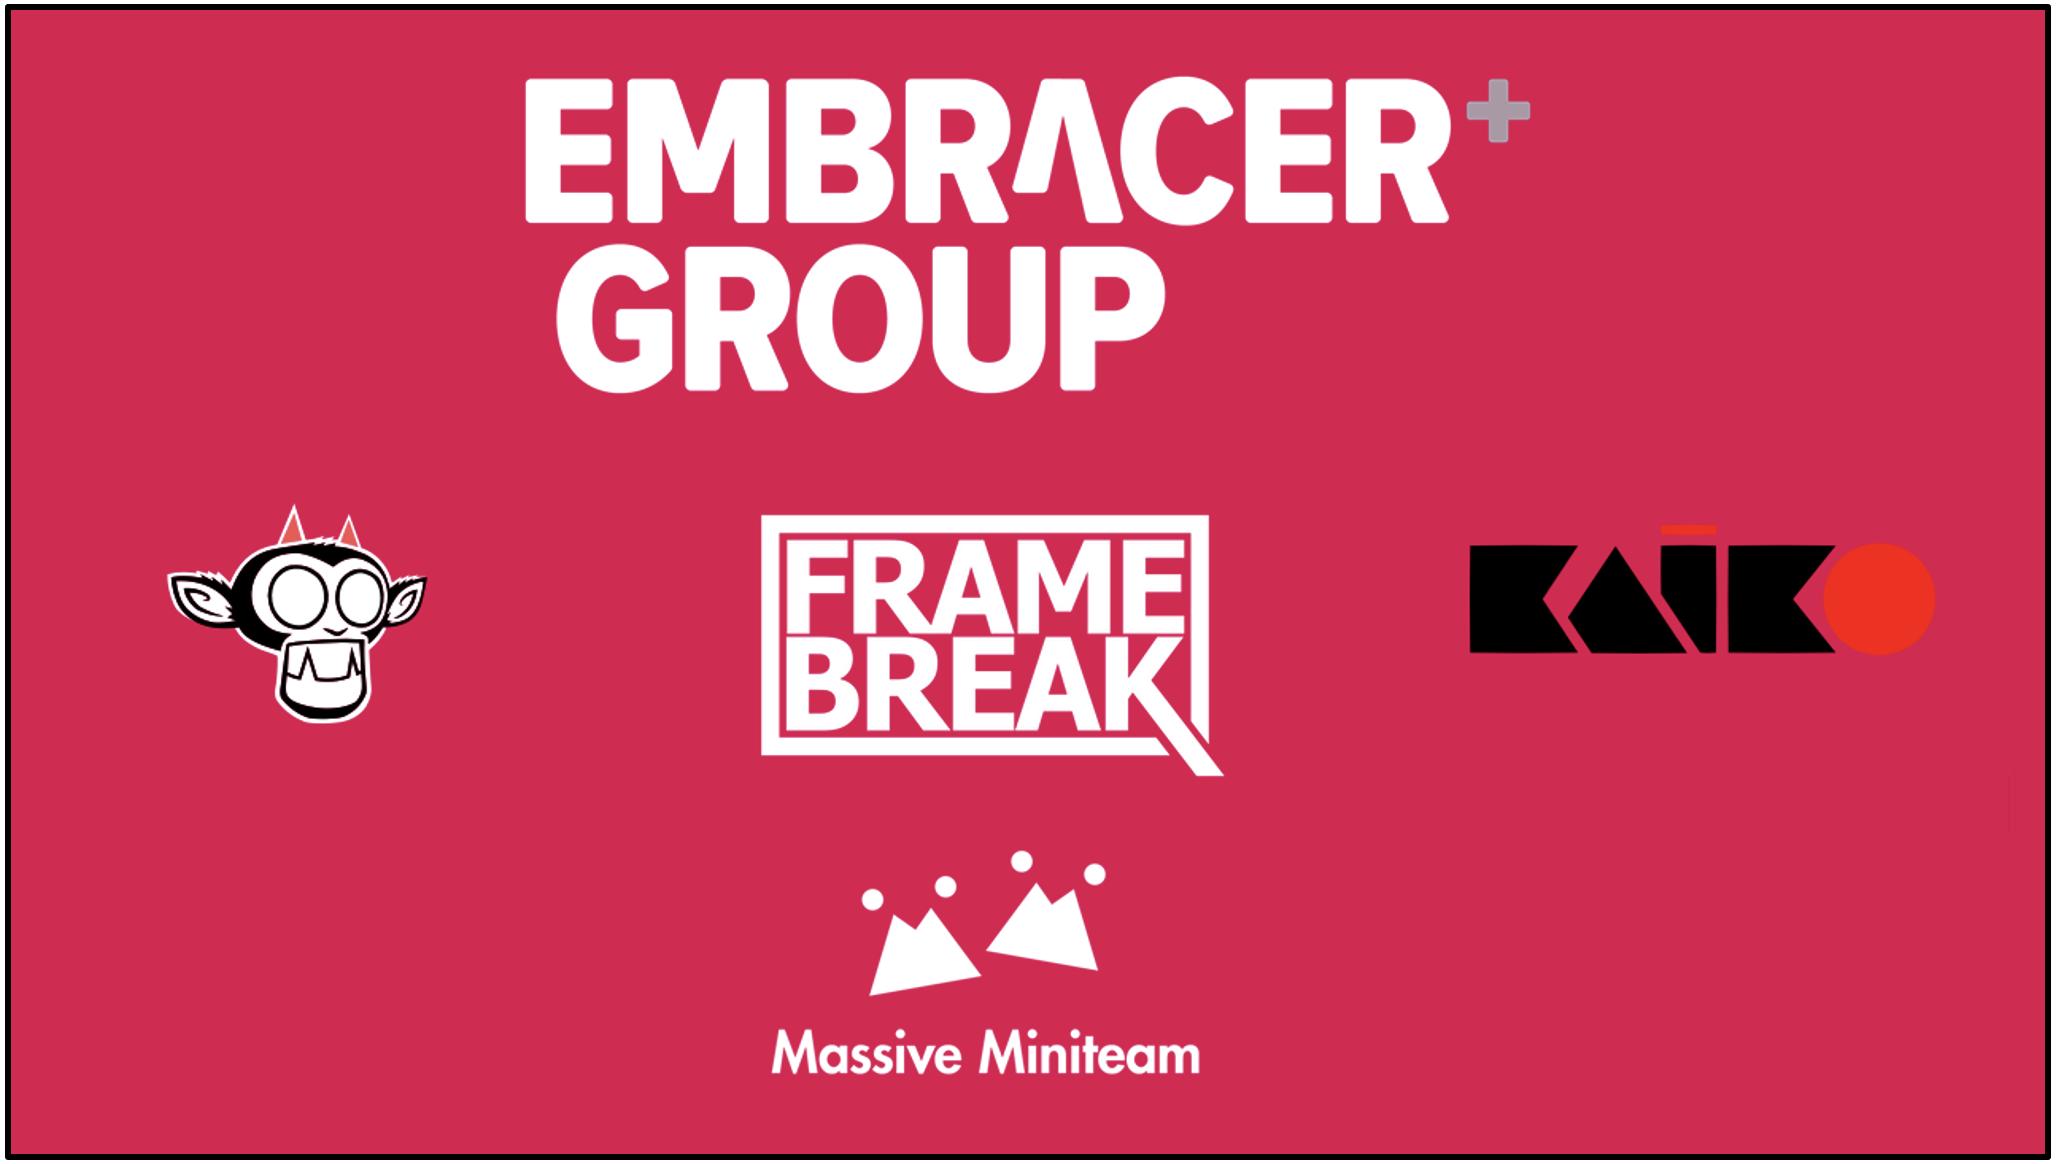 Embracer 4 acquisitions